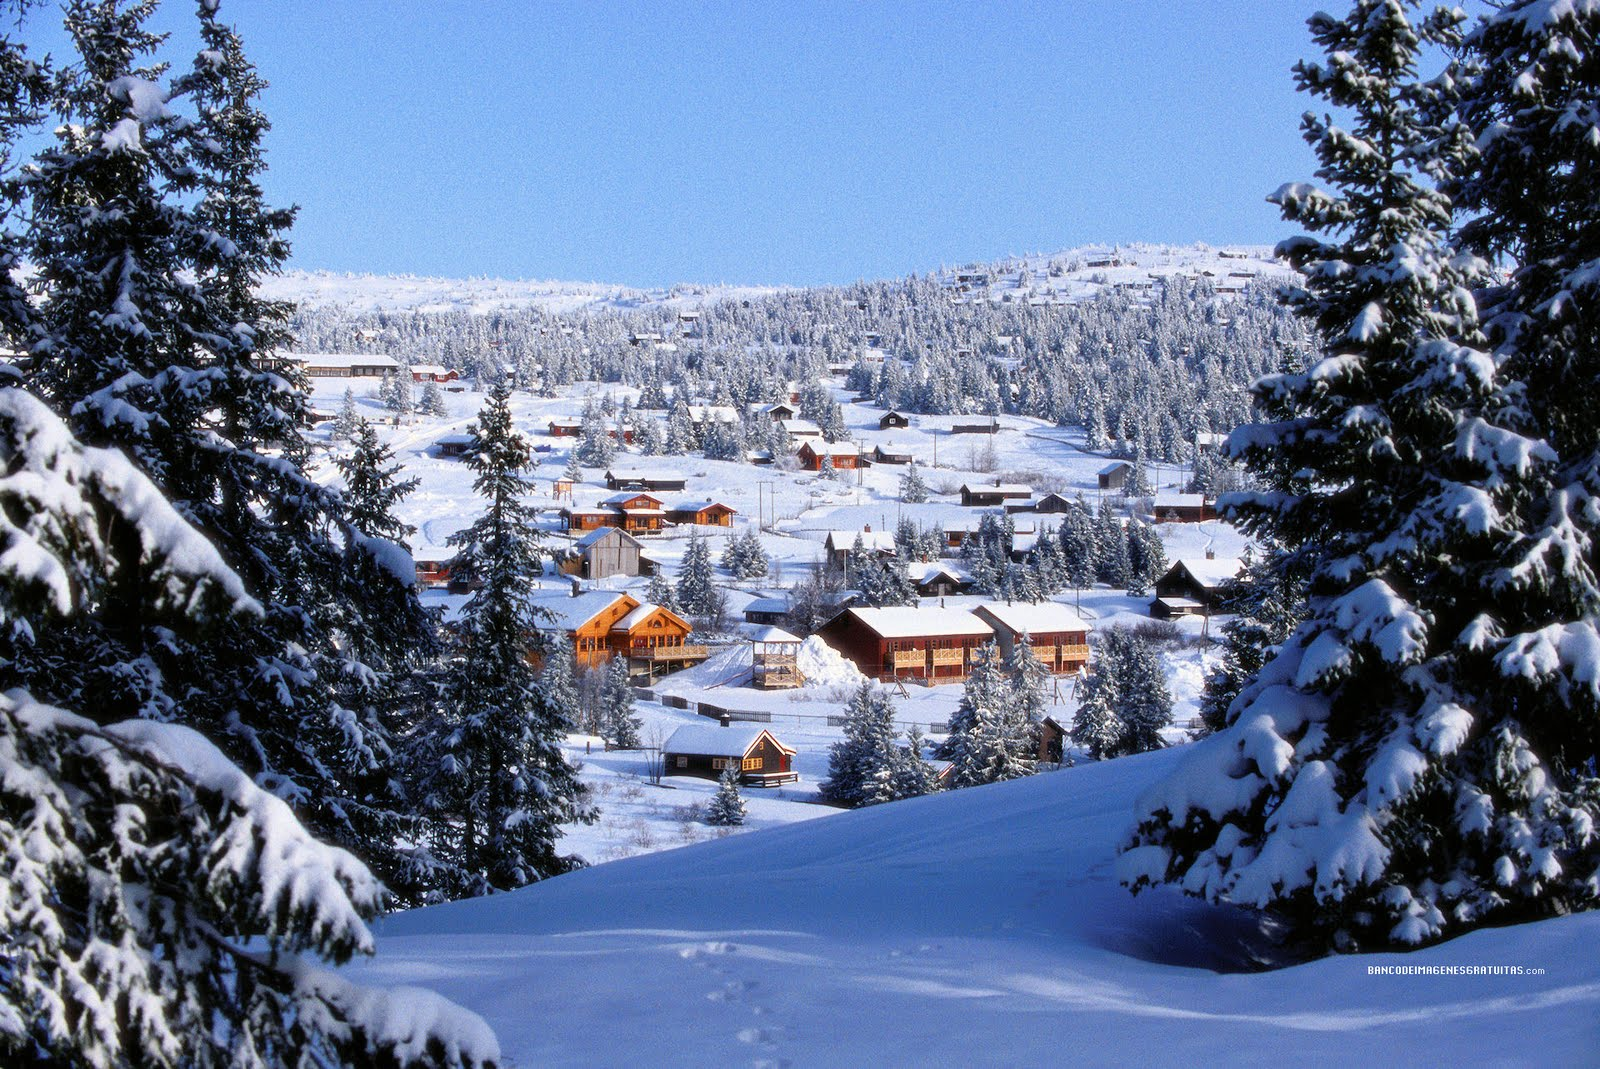 idool Paisajes nevados o snowscapes nieve en las montaas